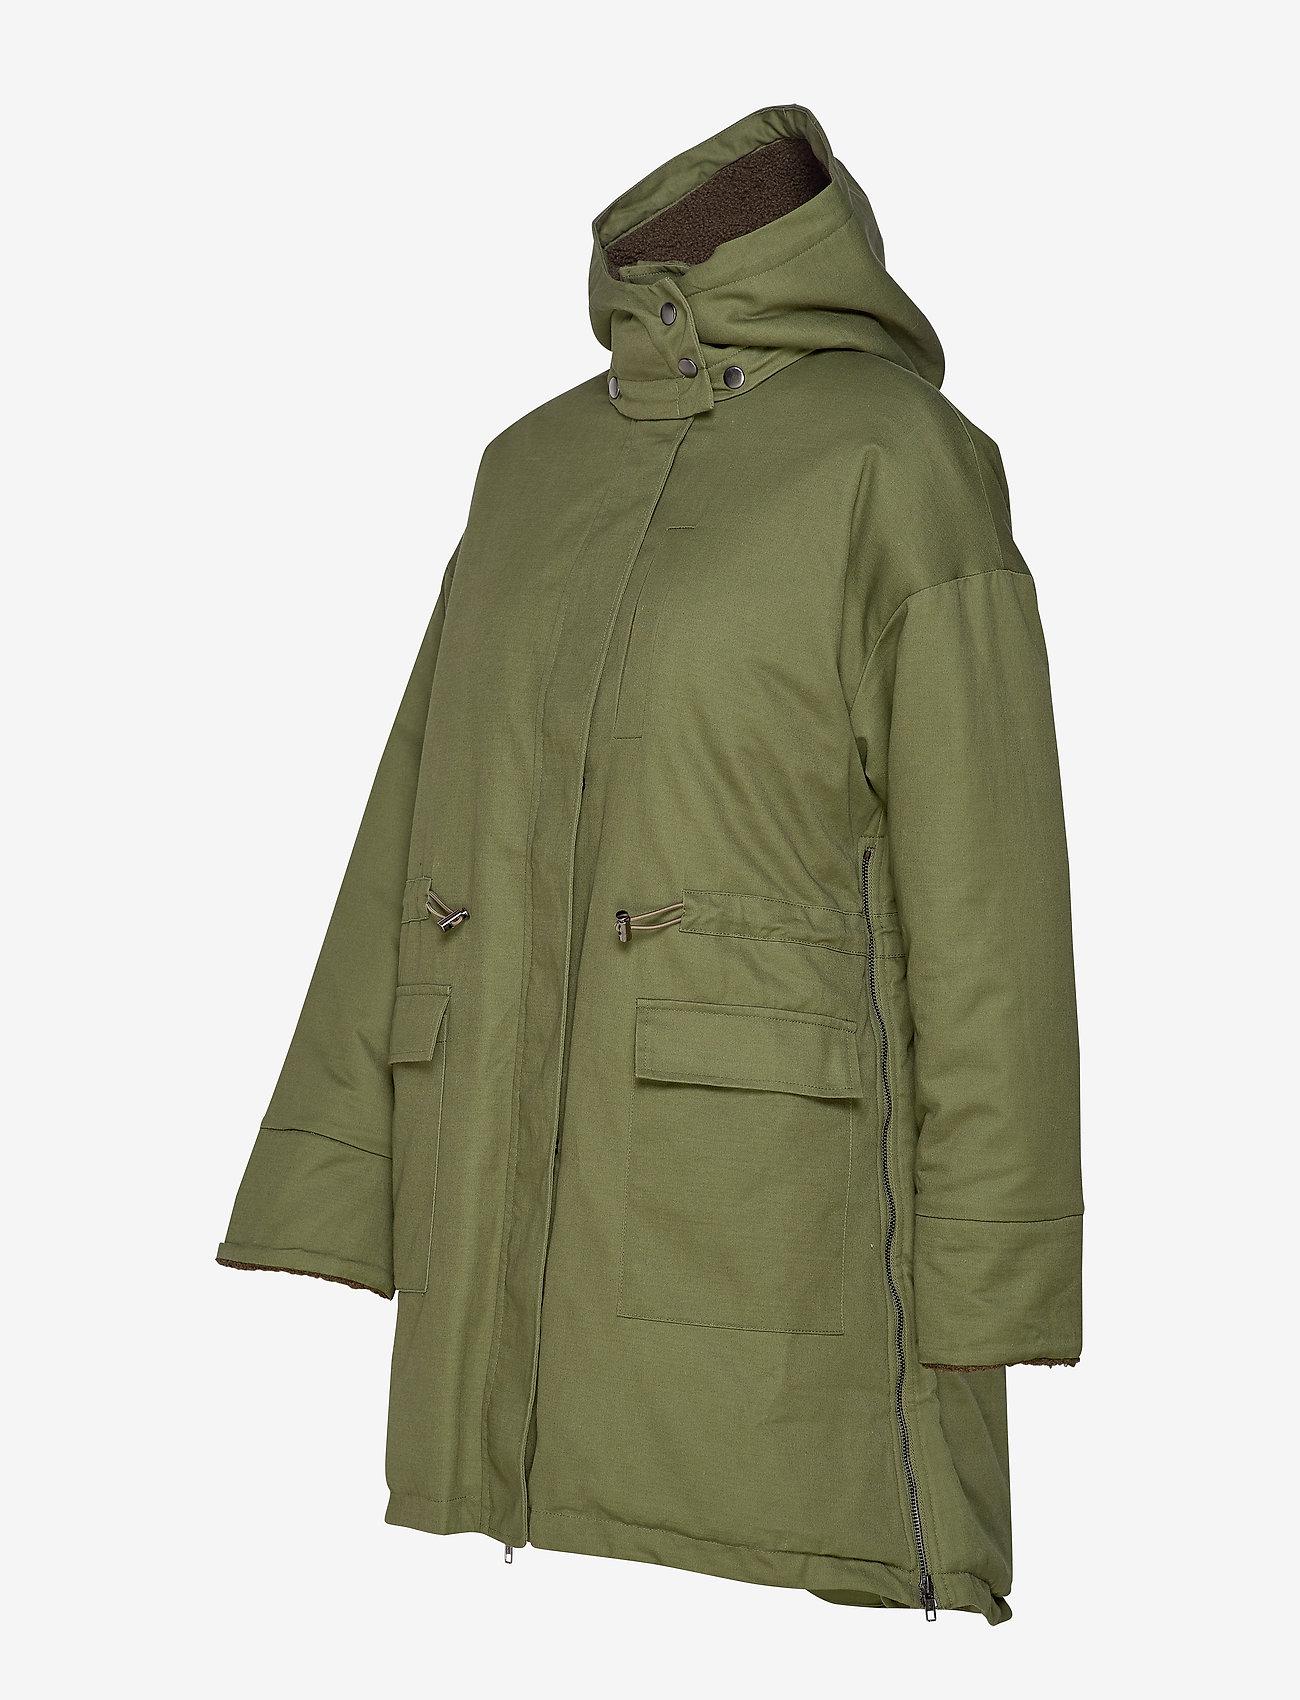 Polar (Green) (2579.40 kr) - Camilla Pihl